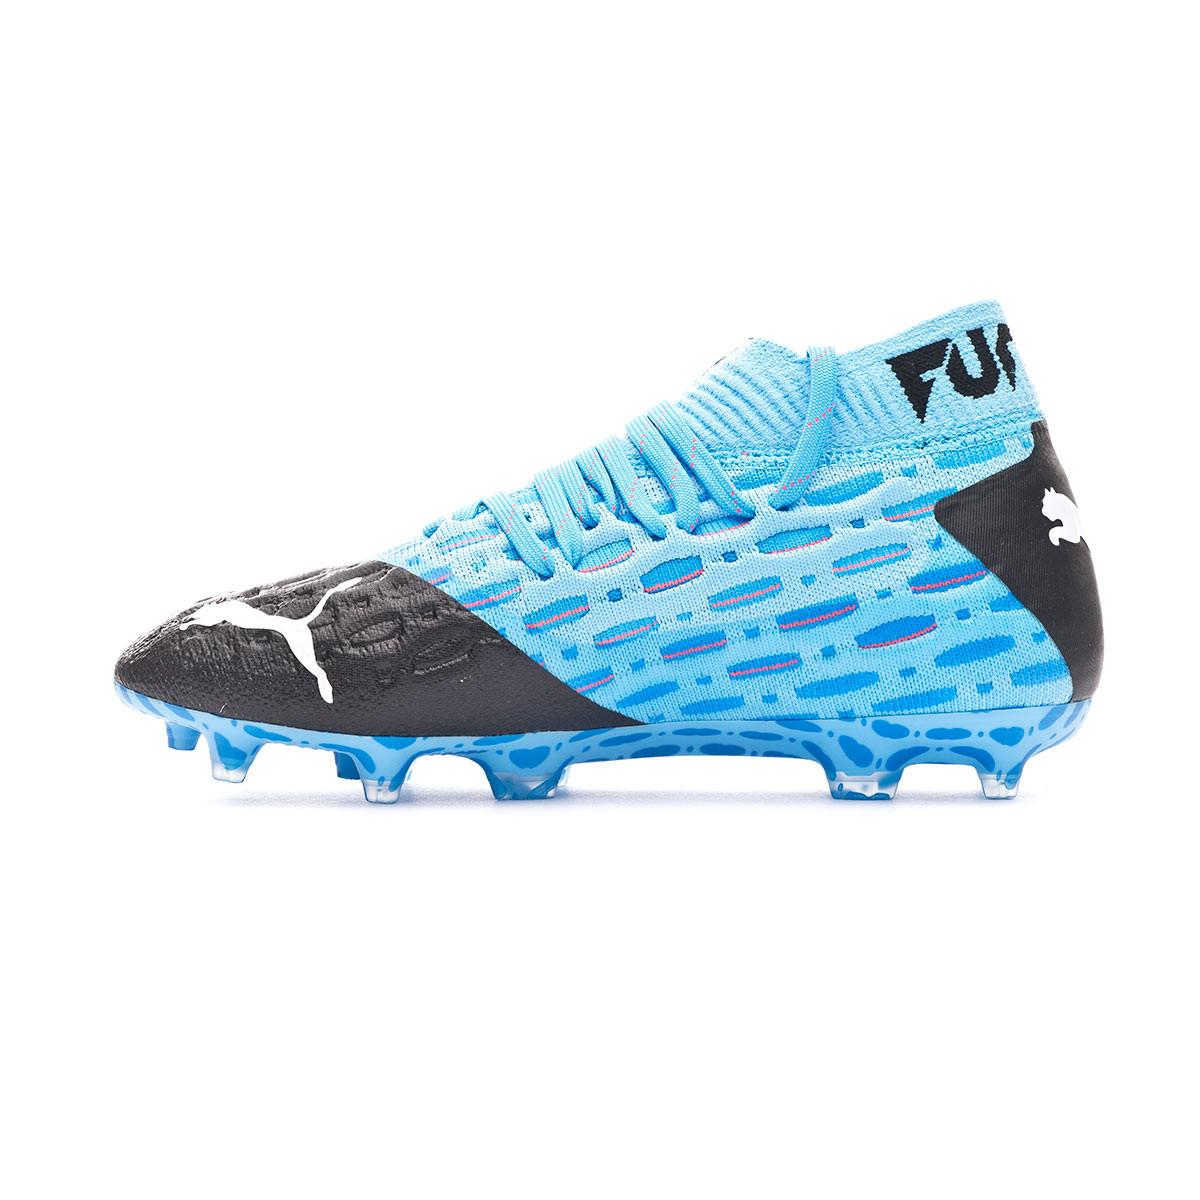 Monje tapa Diplomático  Bota de fútbol Puma Future 5.1 NETFIT FG/AG Niño Luminous Blue ...